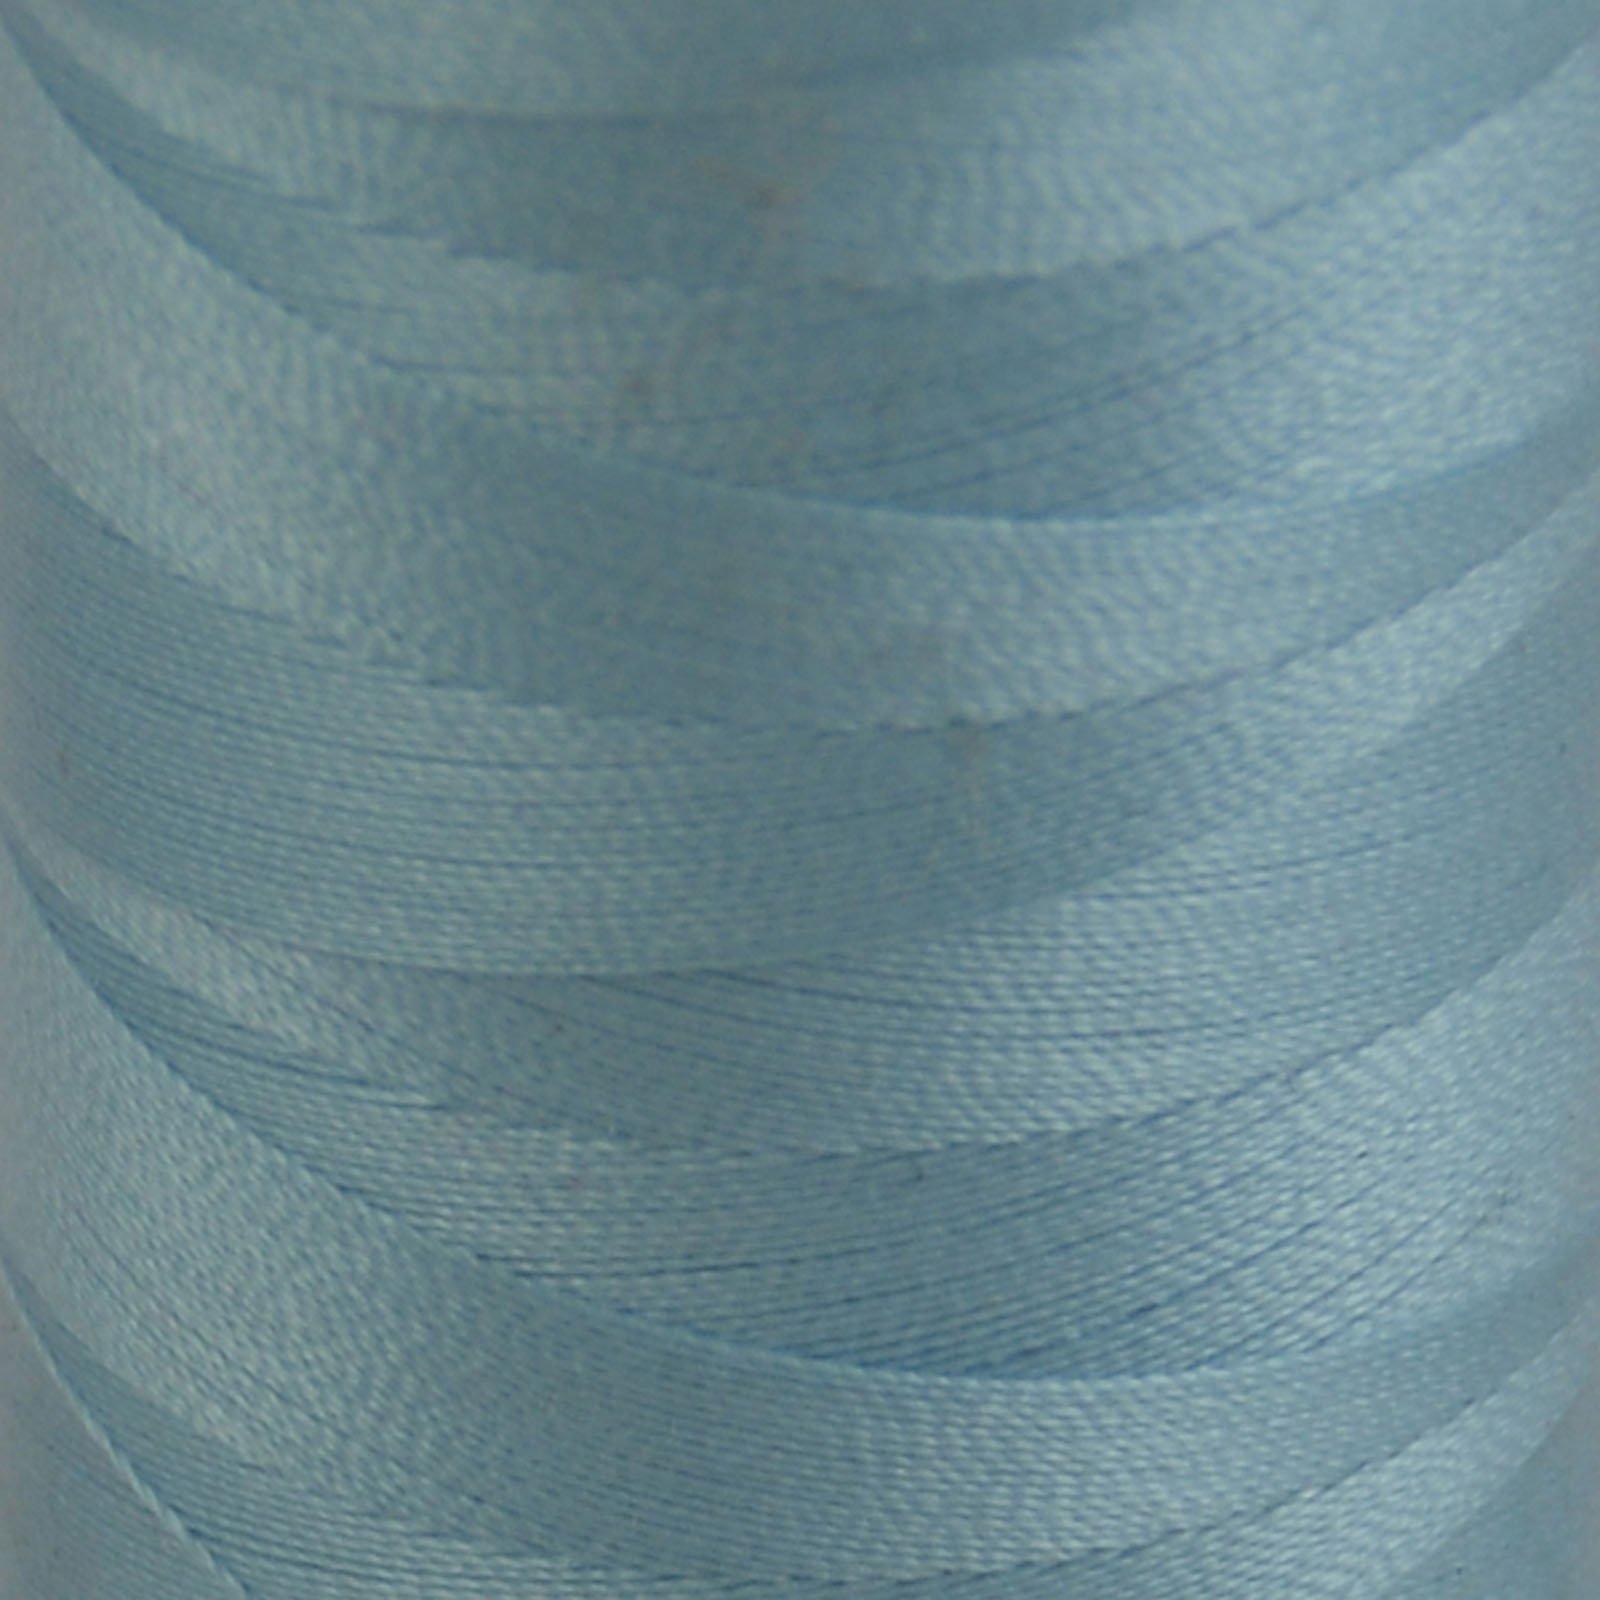 # 2805 Light Grey Turquoise